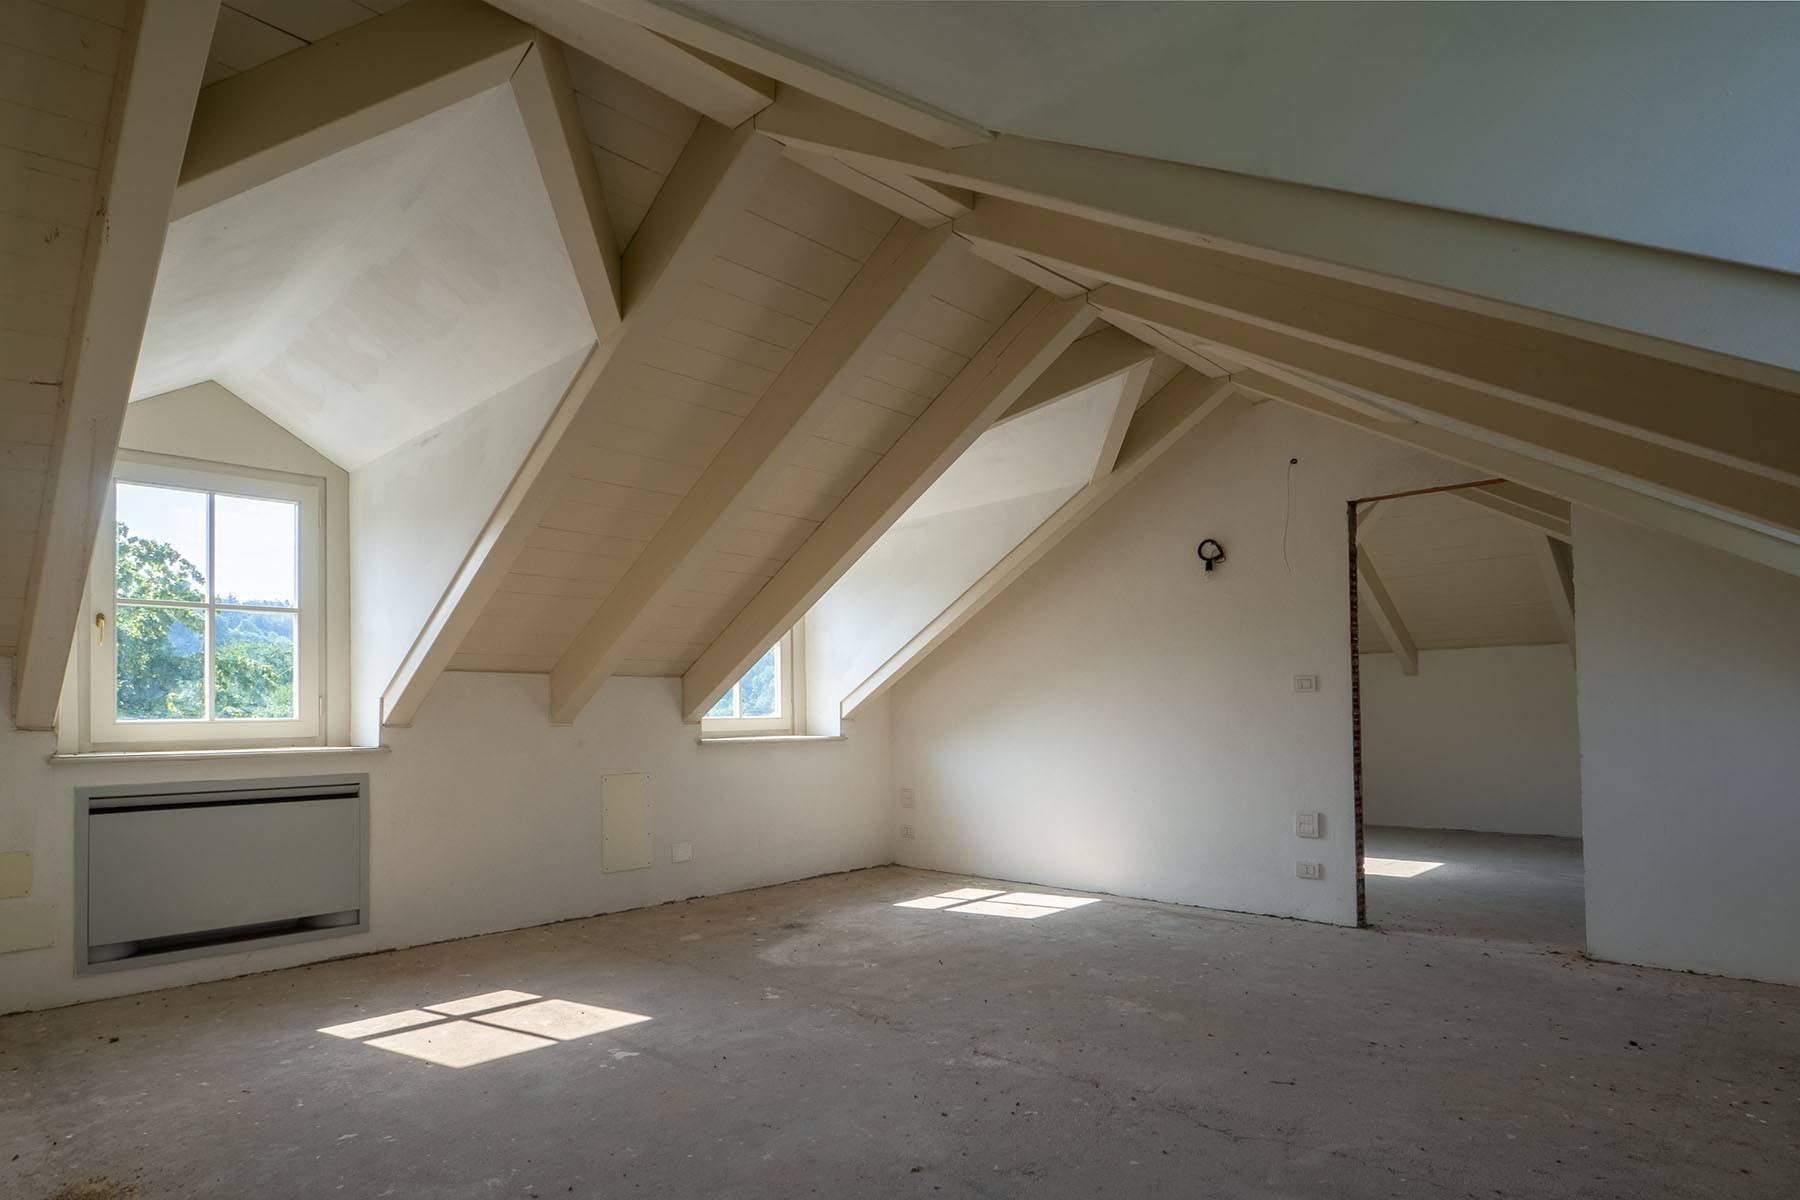 Casa indipendente in Vendita a Torino: 5 locali, 400 mq - Foto 10